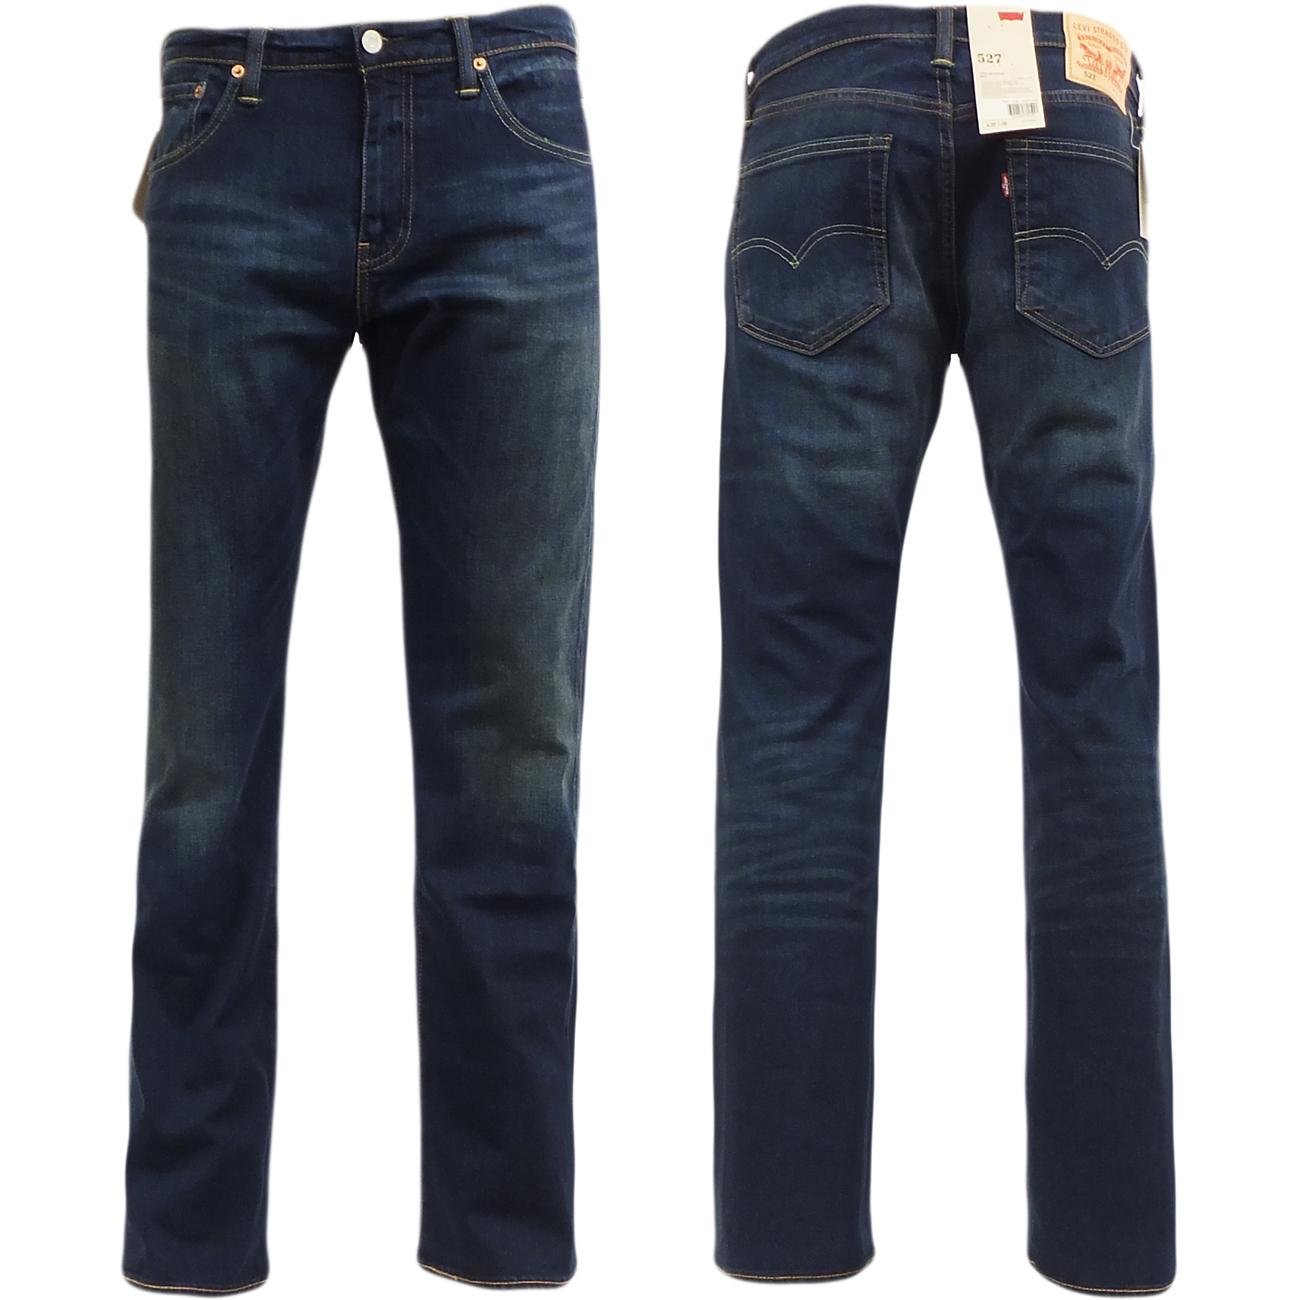 Levi Strauss Jean 527 Green Edge Bootcut | Jeans | Mr H Menswear